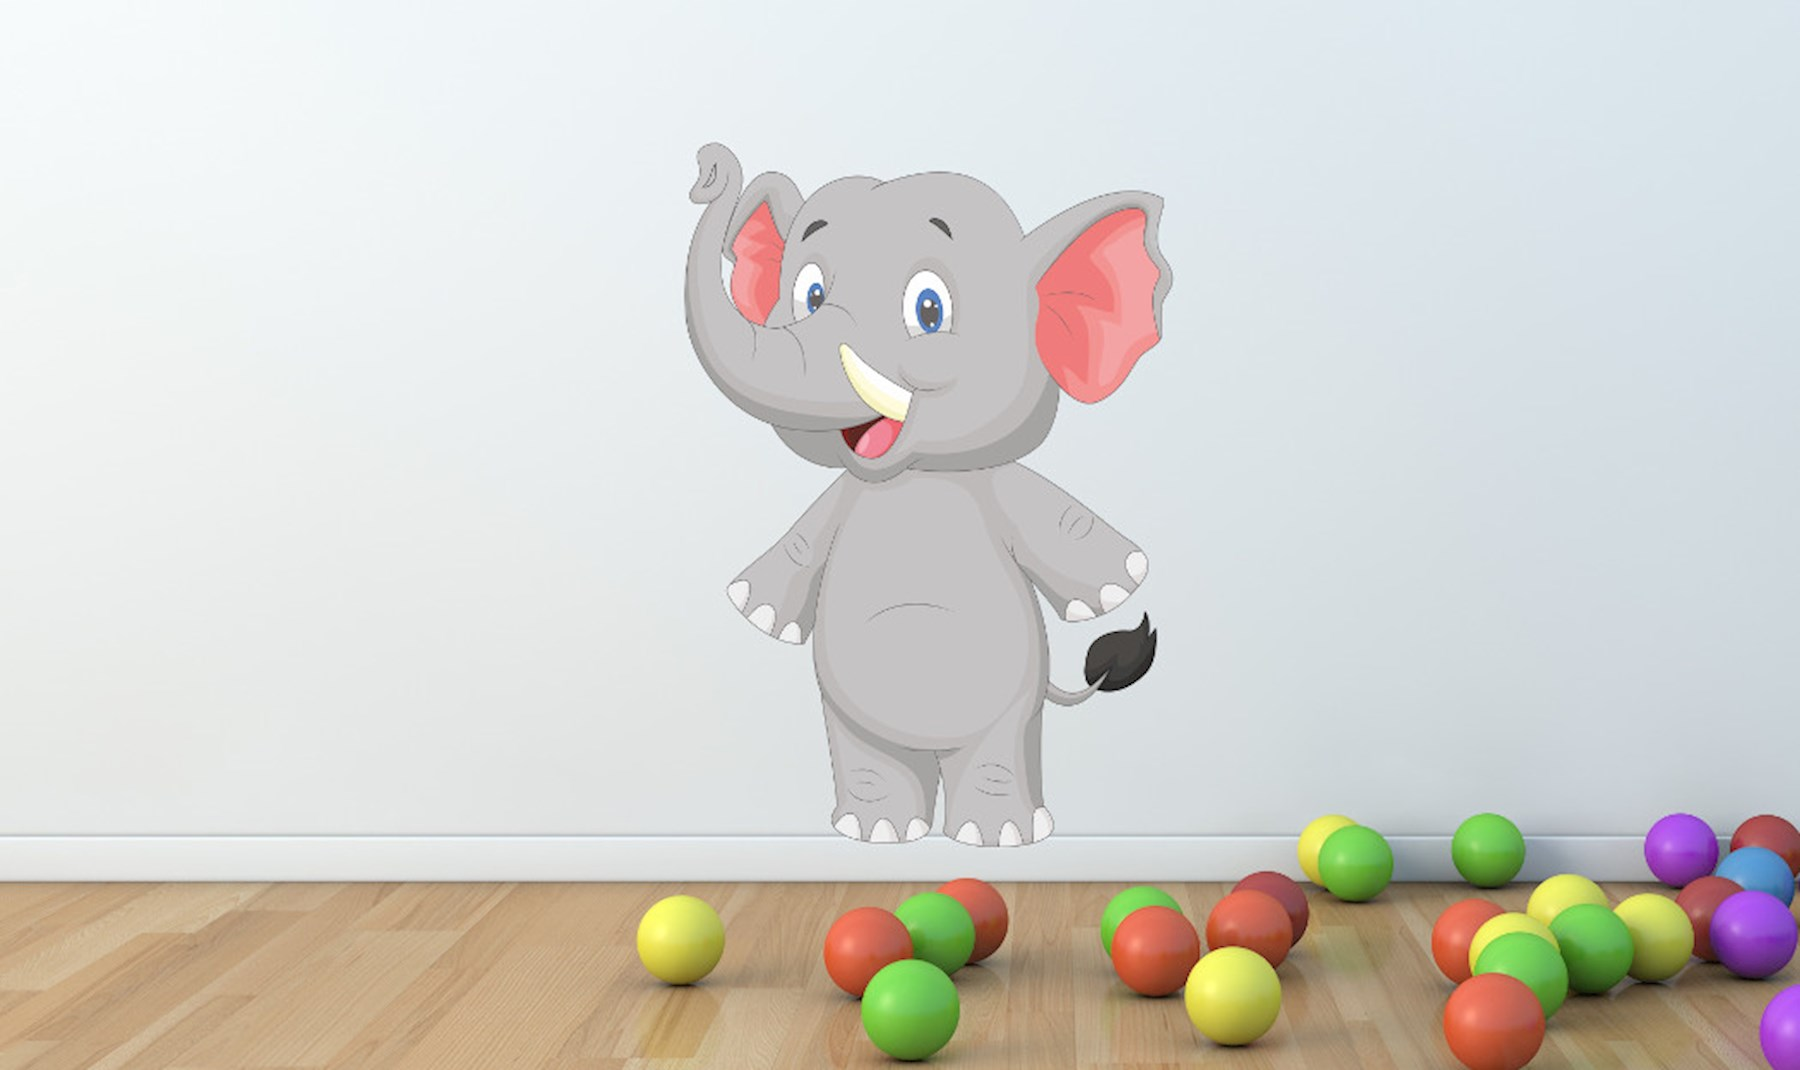 Süßes Elefanten Wandtattoo - XXL Wandsticker mit Elefanten ab 9,90